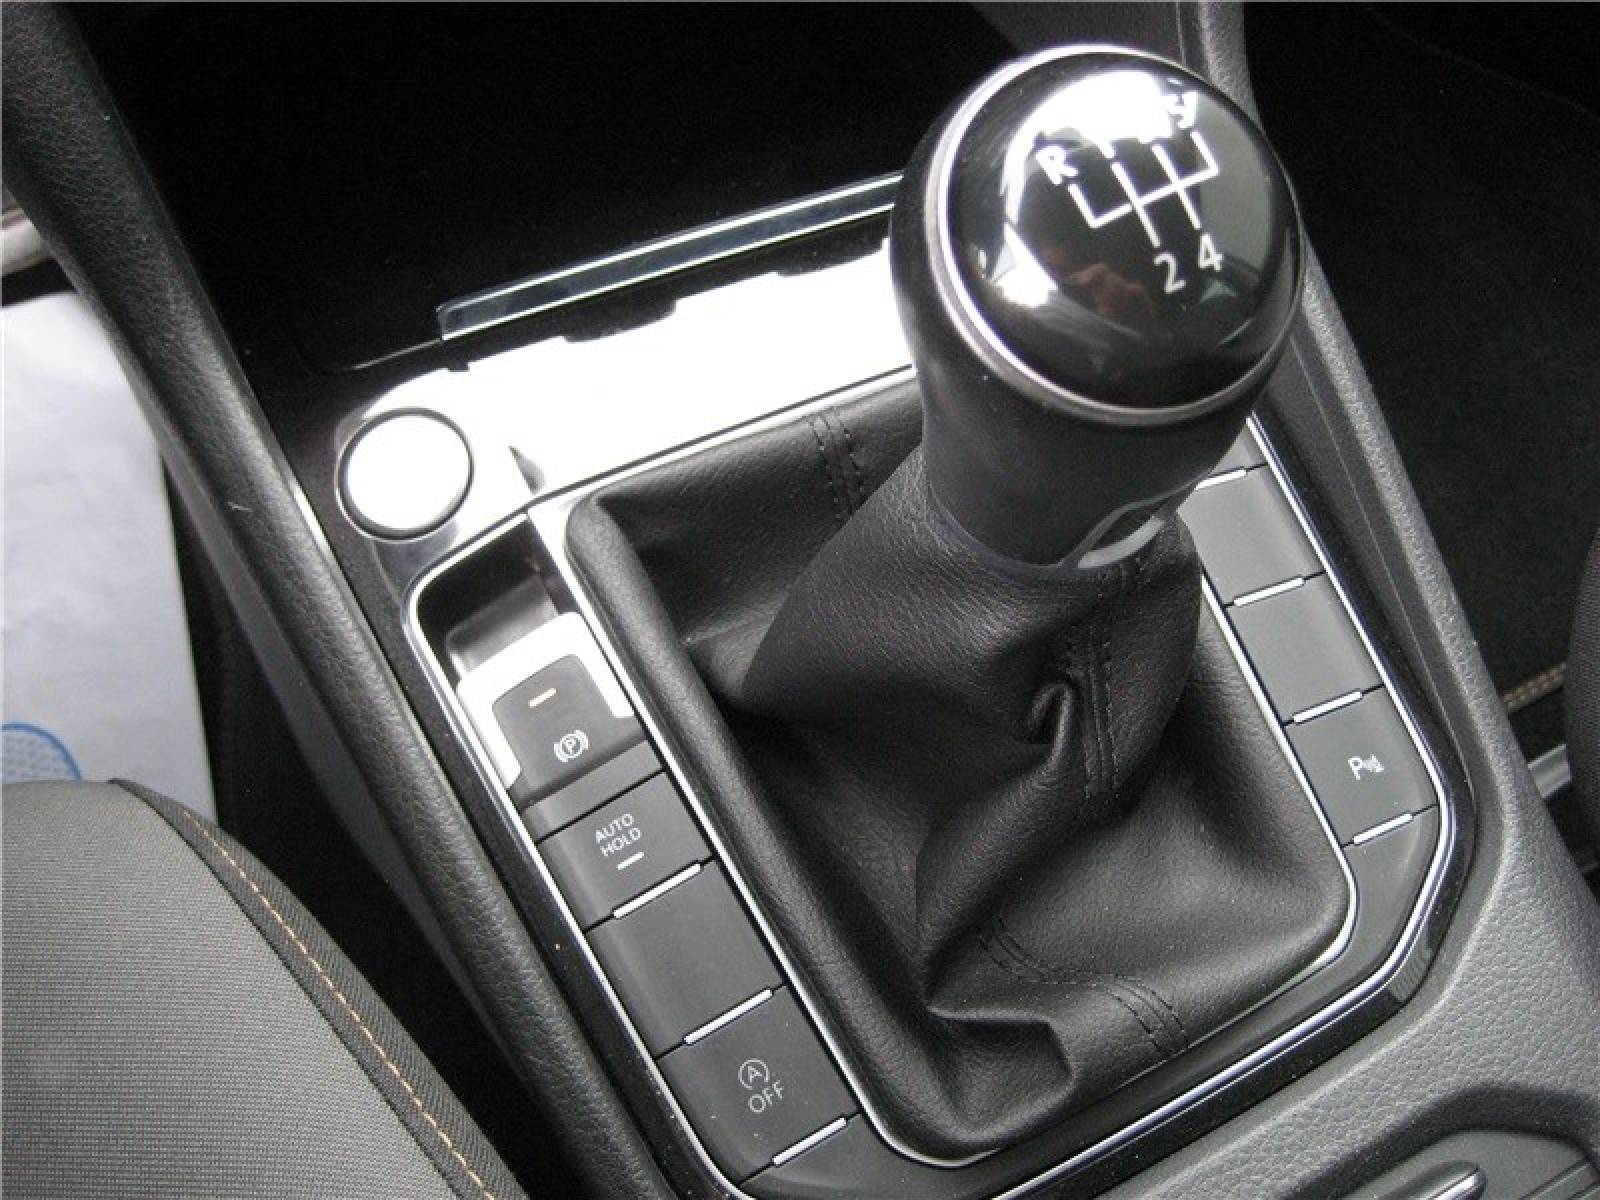 VOLKSWAGEN Golf Sportsvan 1.6 TDI 110 FAP BlueMotion Technology - véhicule d'occasion - LEMAUVIEL AUTOMOBILES - Présentation site web V2 - Lemauviel Automobiles - VIRE - 14500 - VIRE - 12